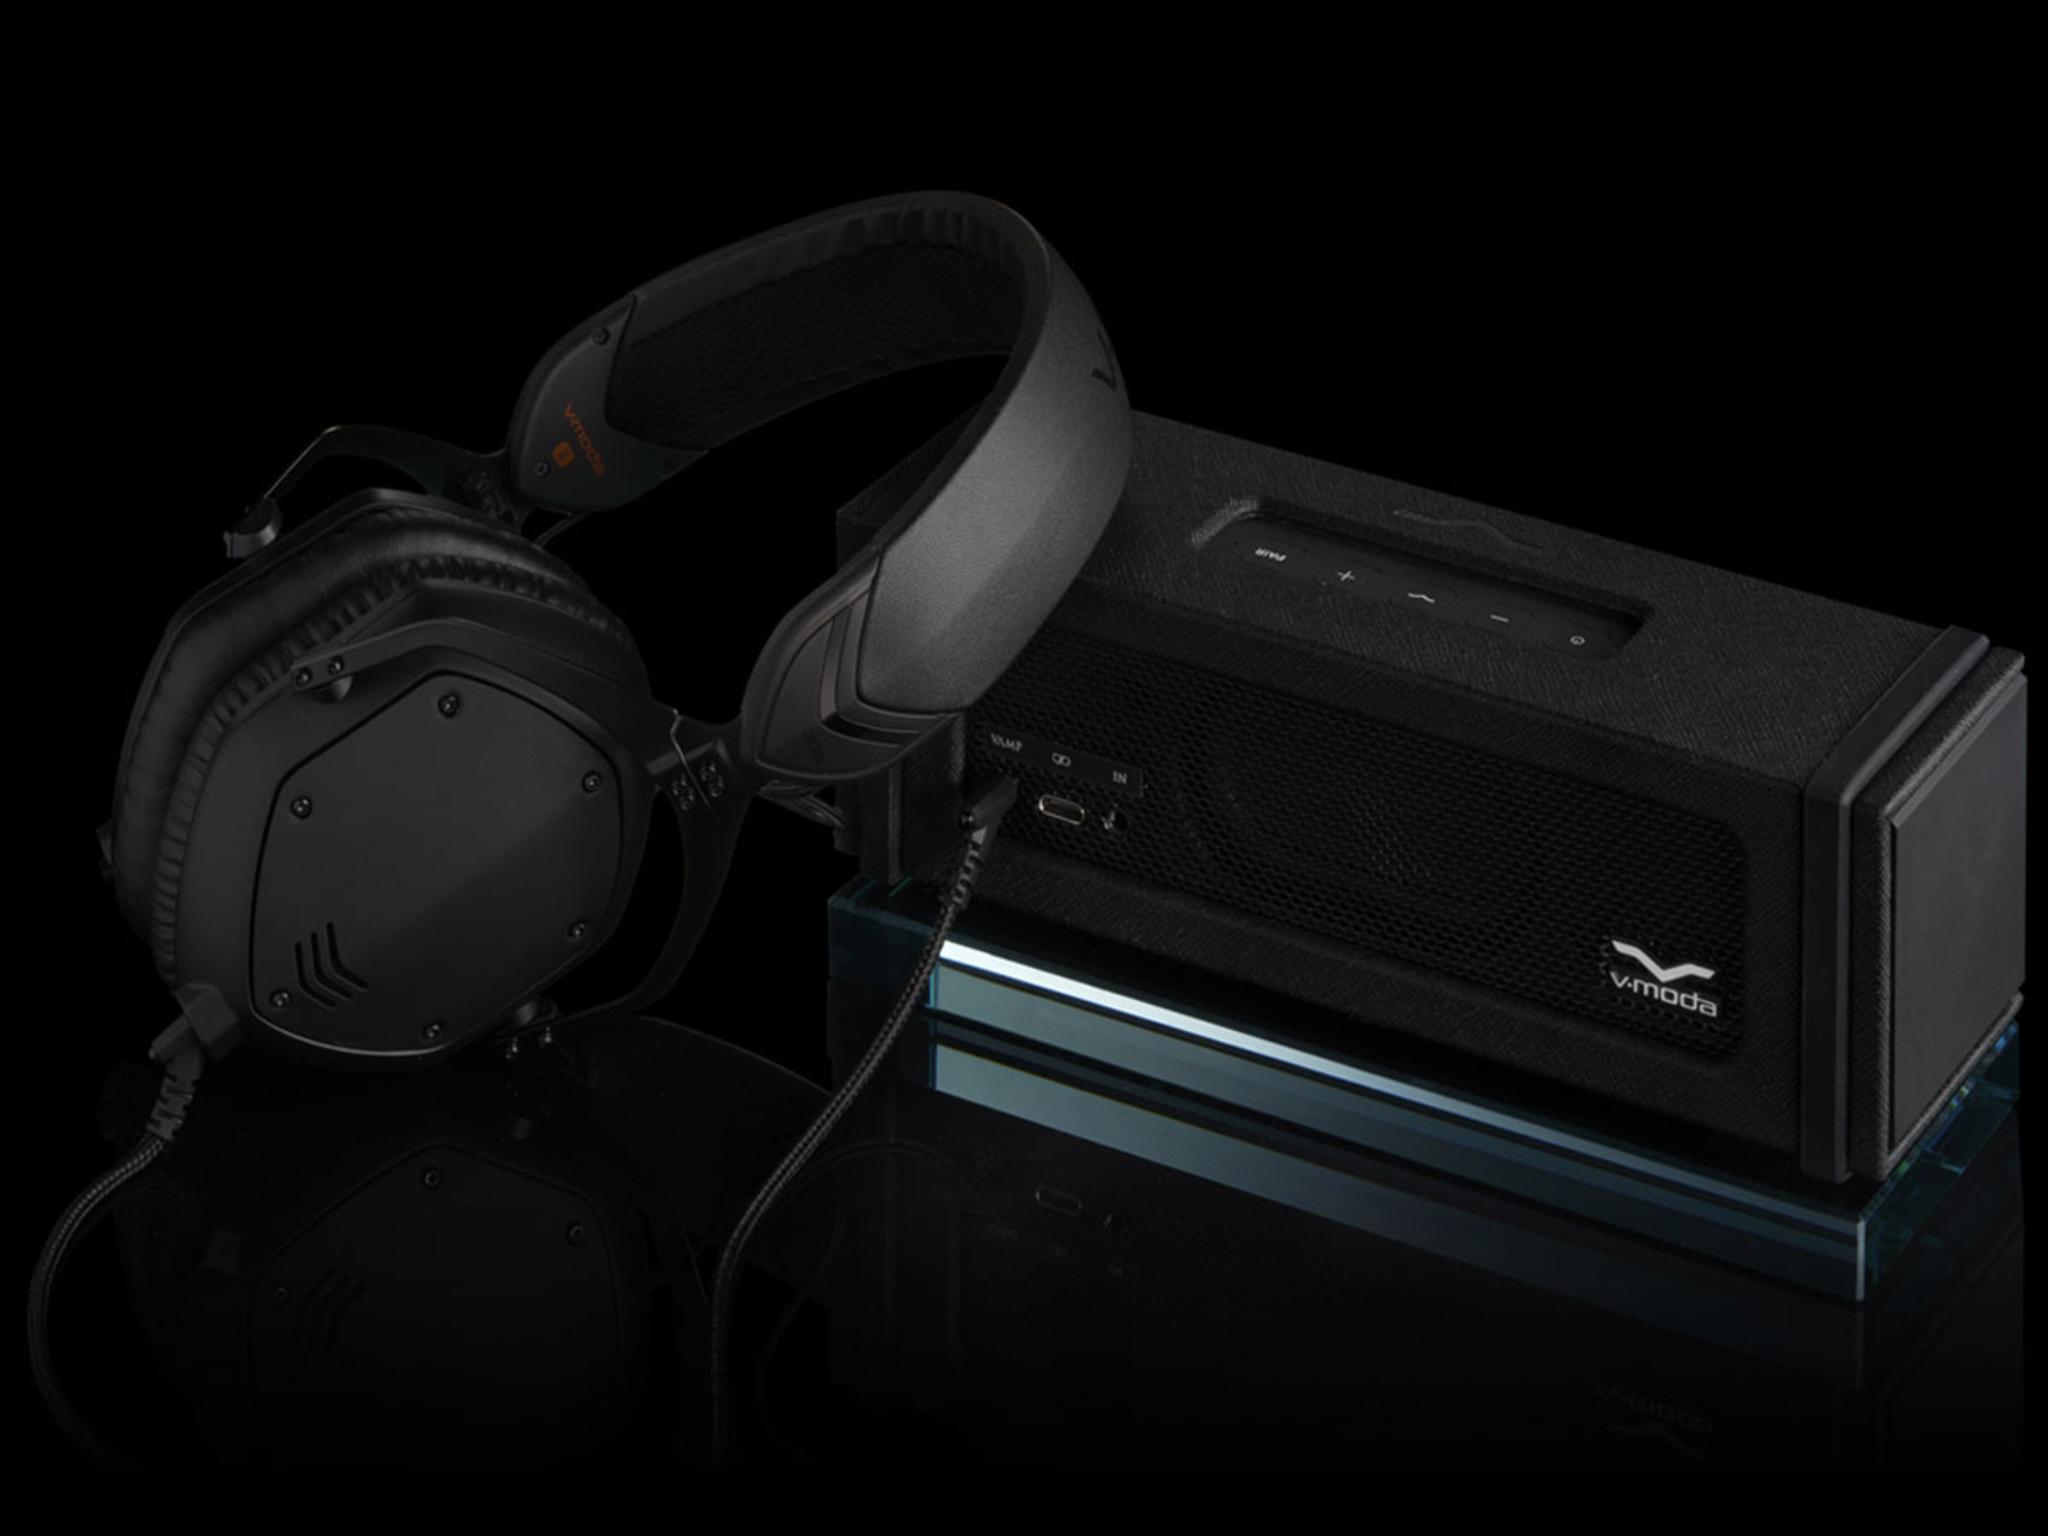 Black Remix Bluetooth HiFi Speaker Used as a Headphone Amp